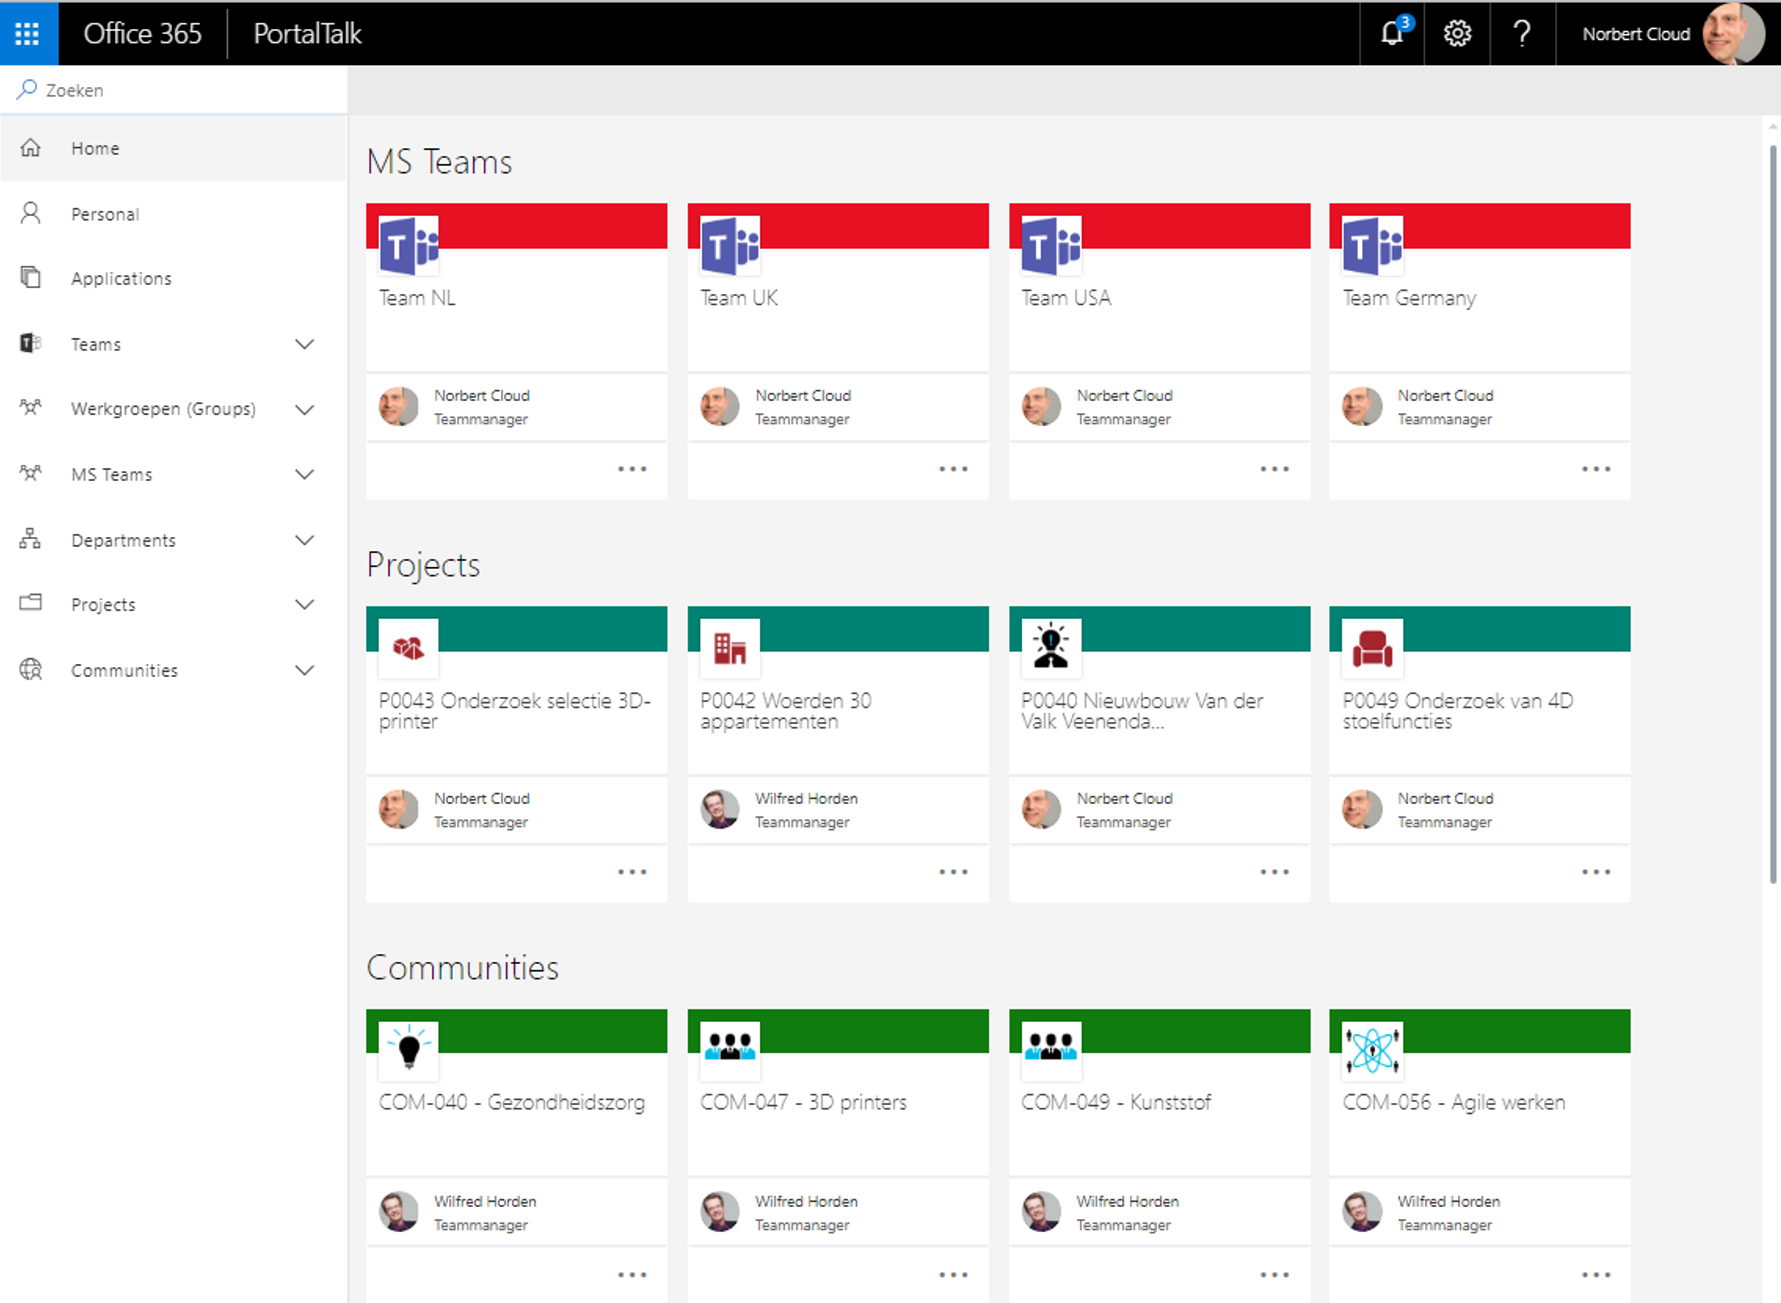 PortalTalk 365 screenshot